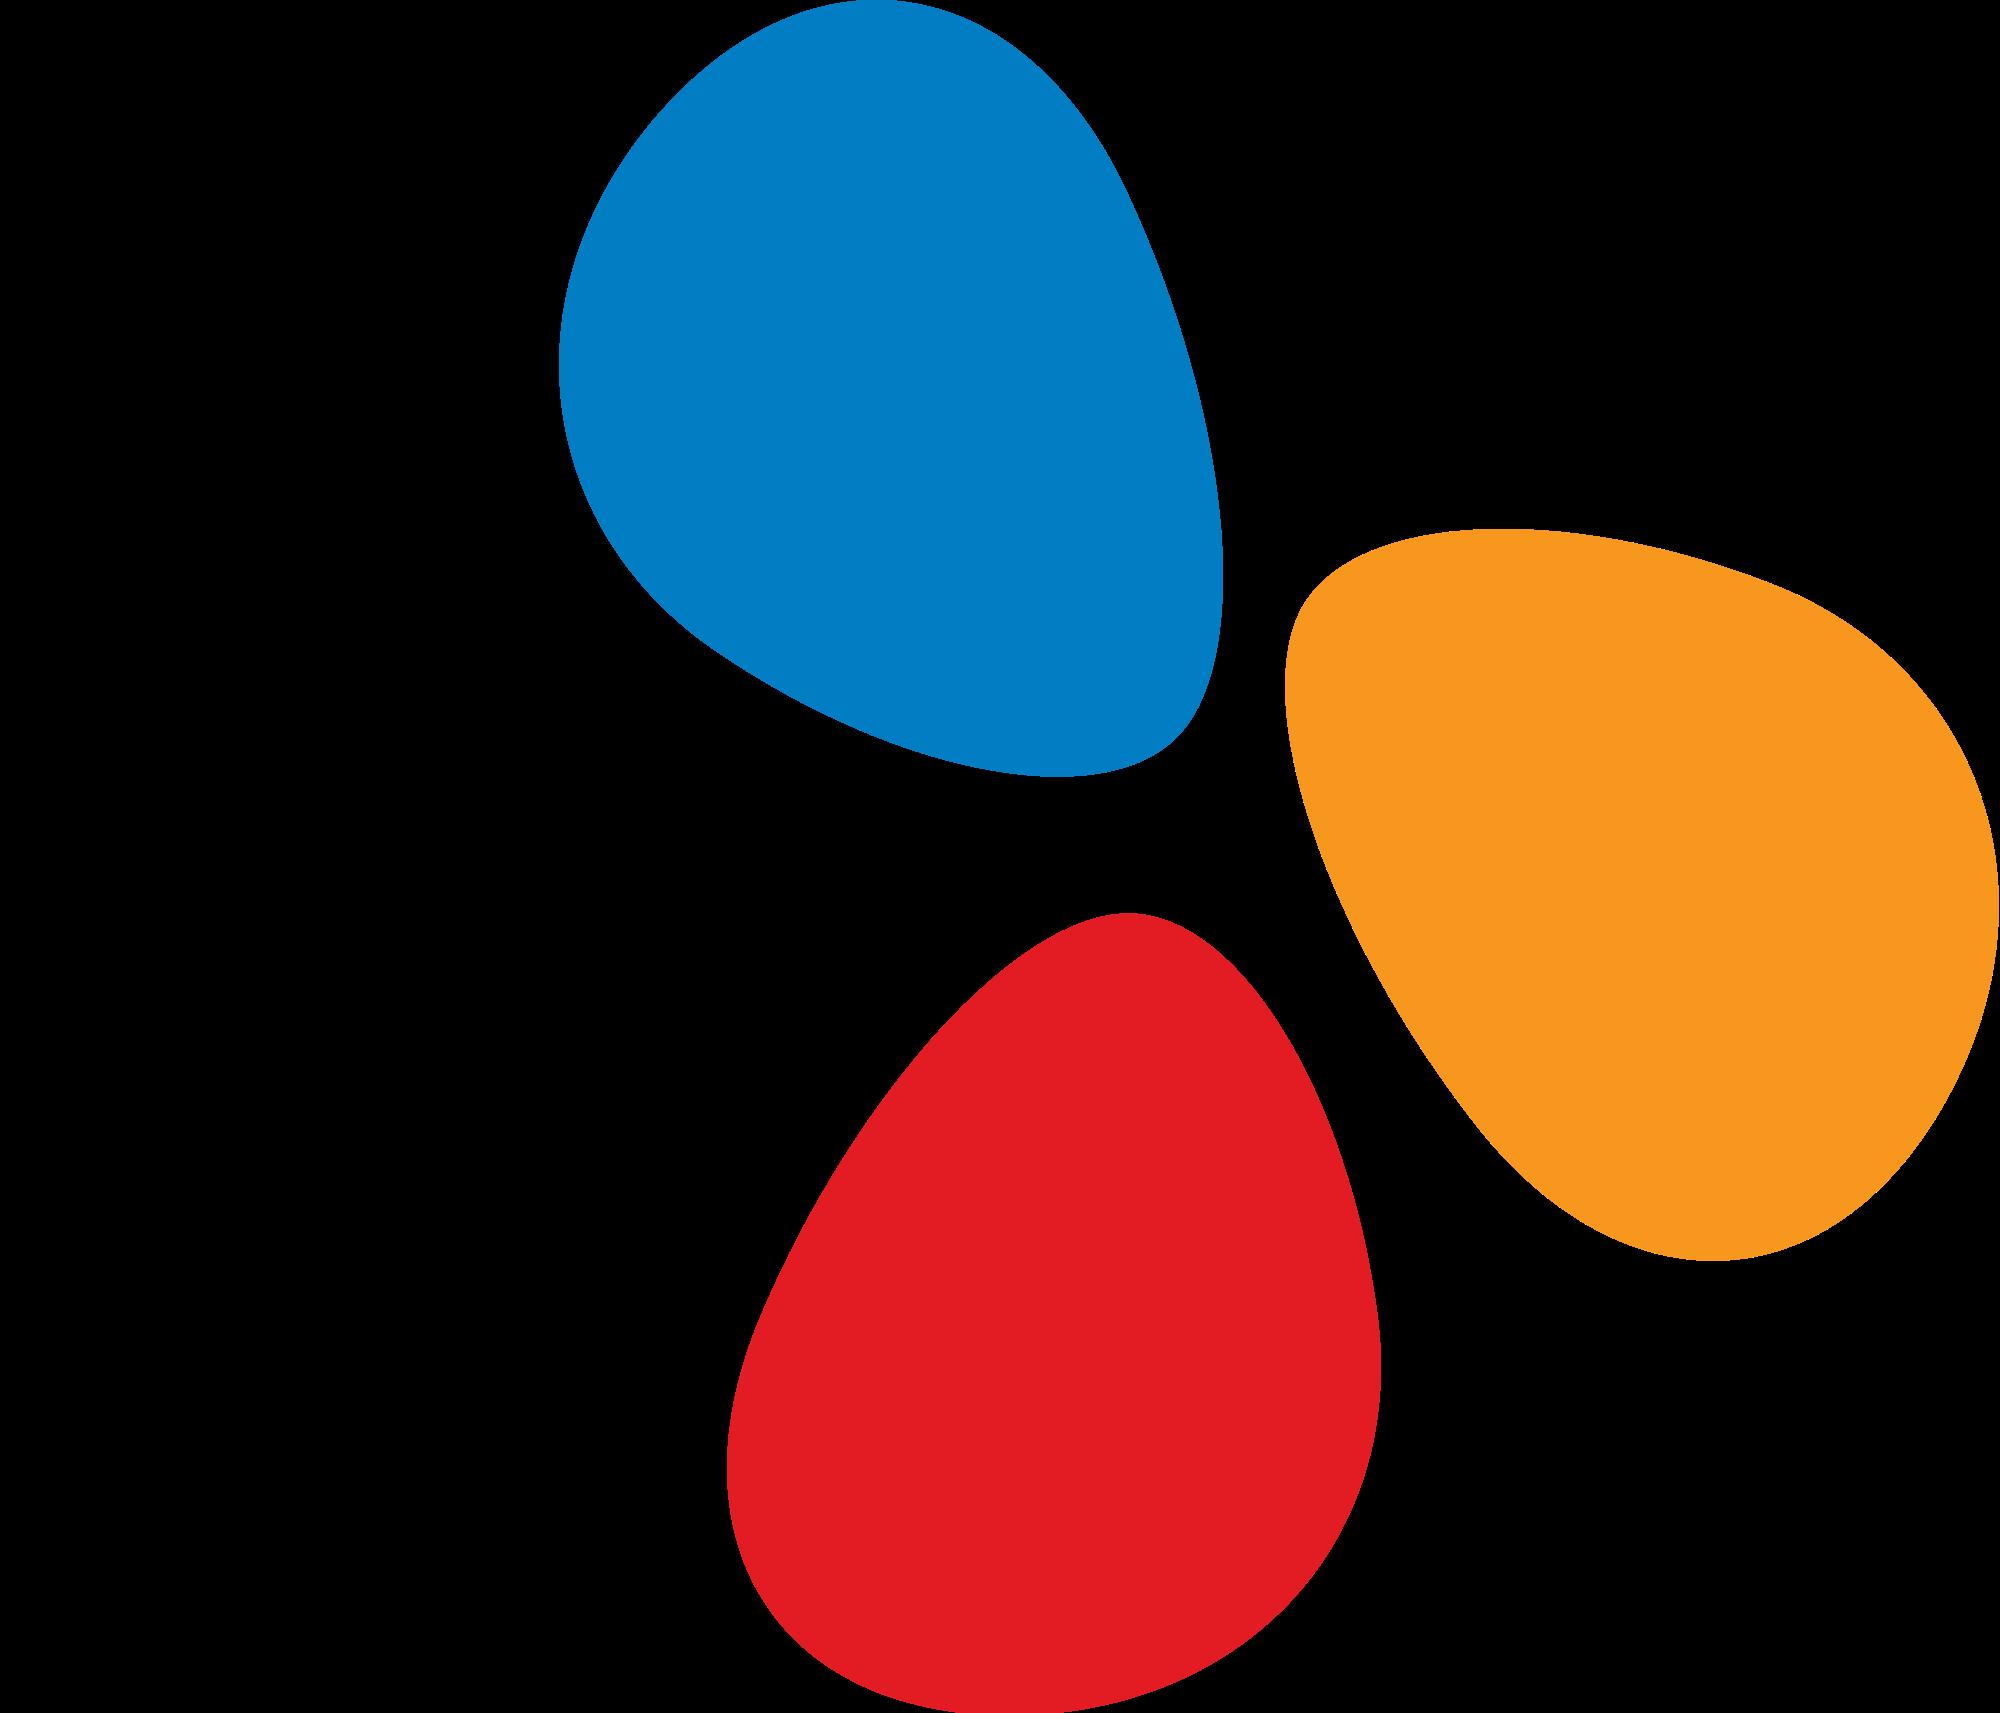 Cj group wikipedia logosvg. Frozen clipart tulisan